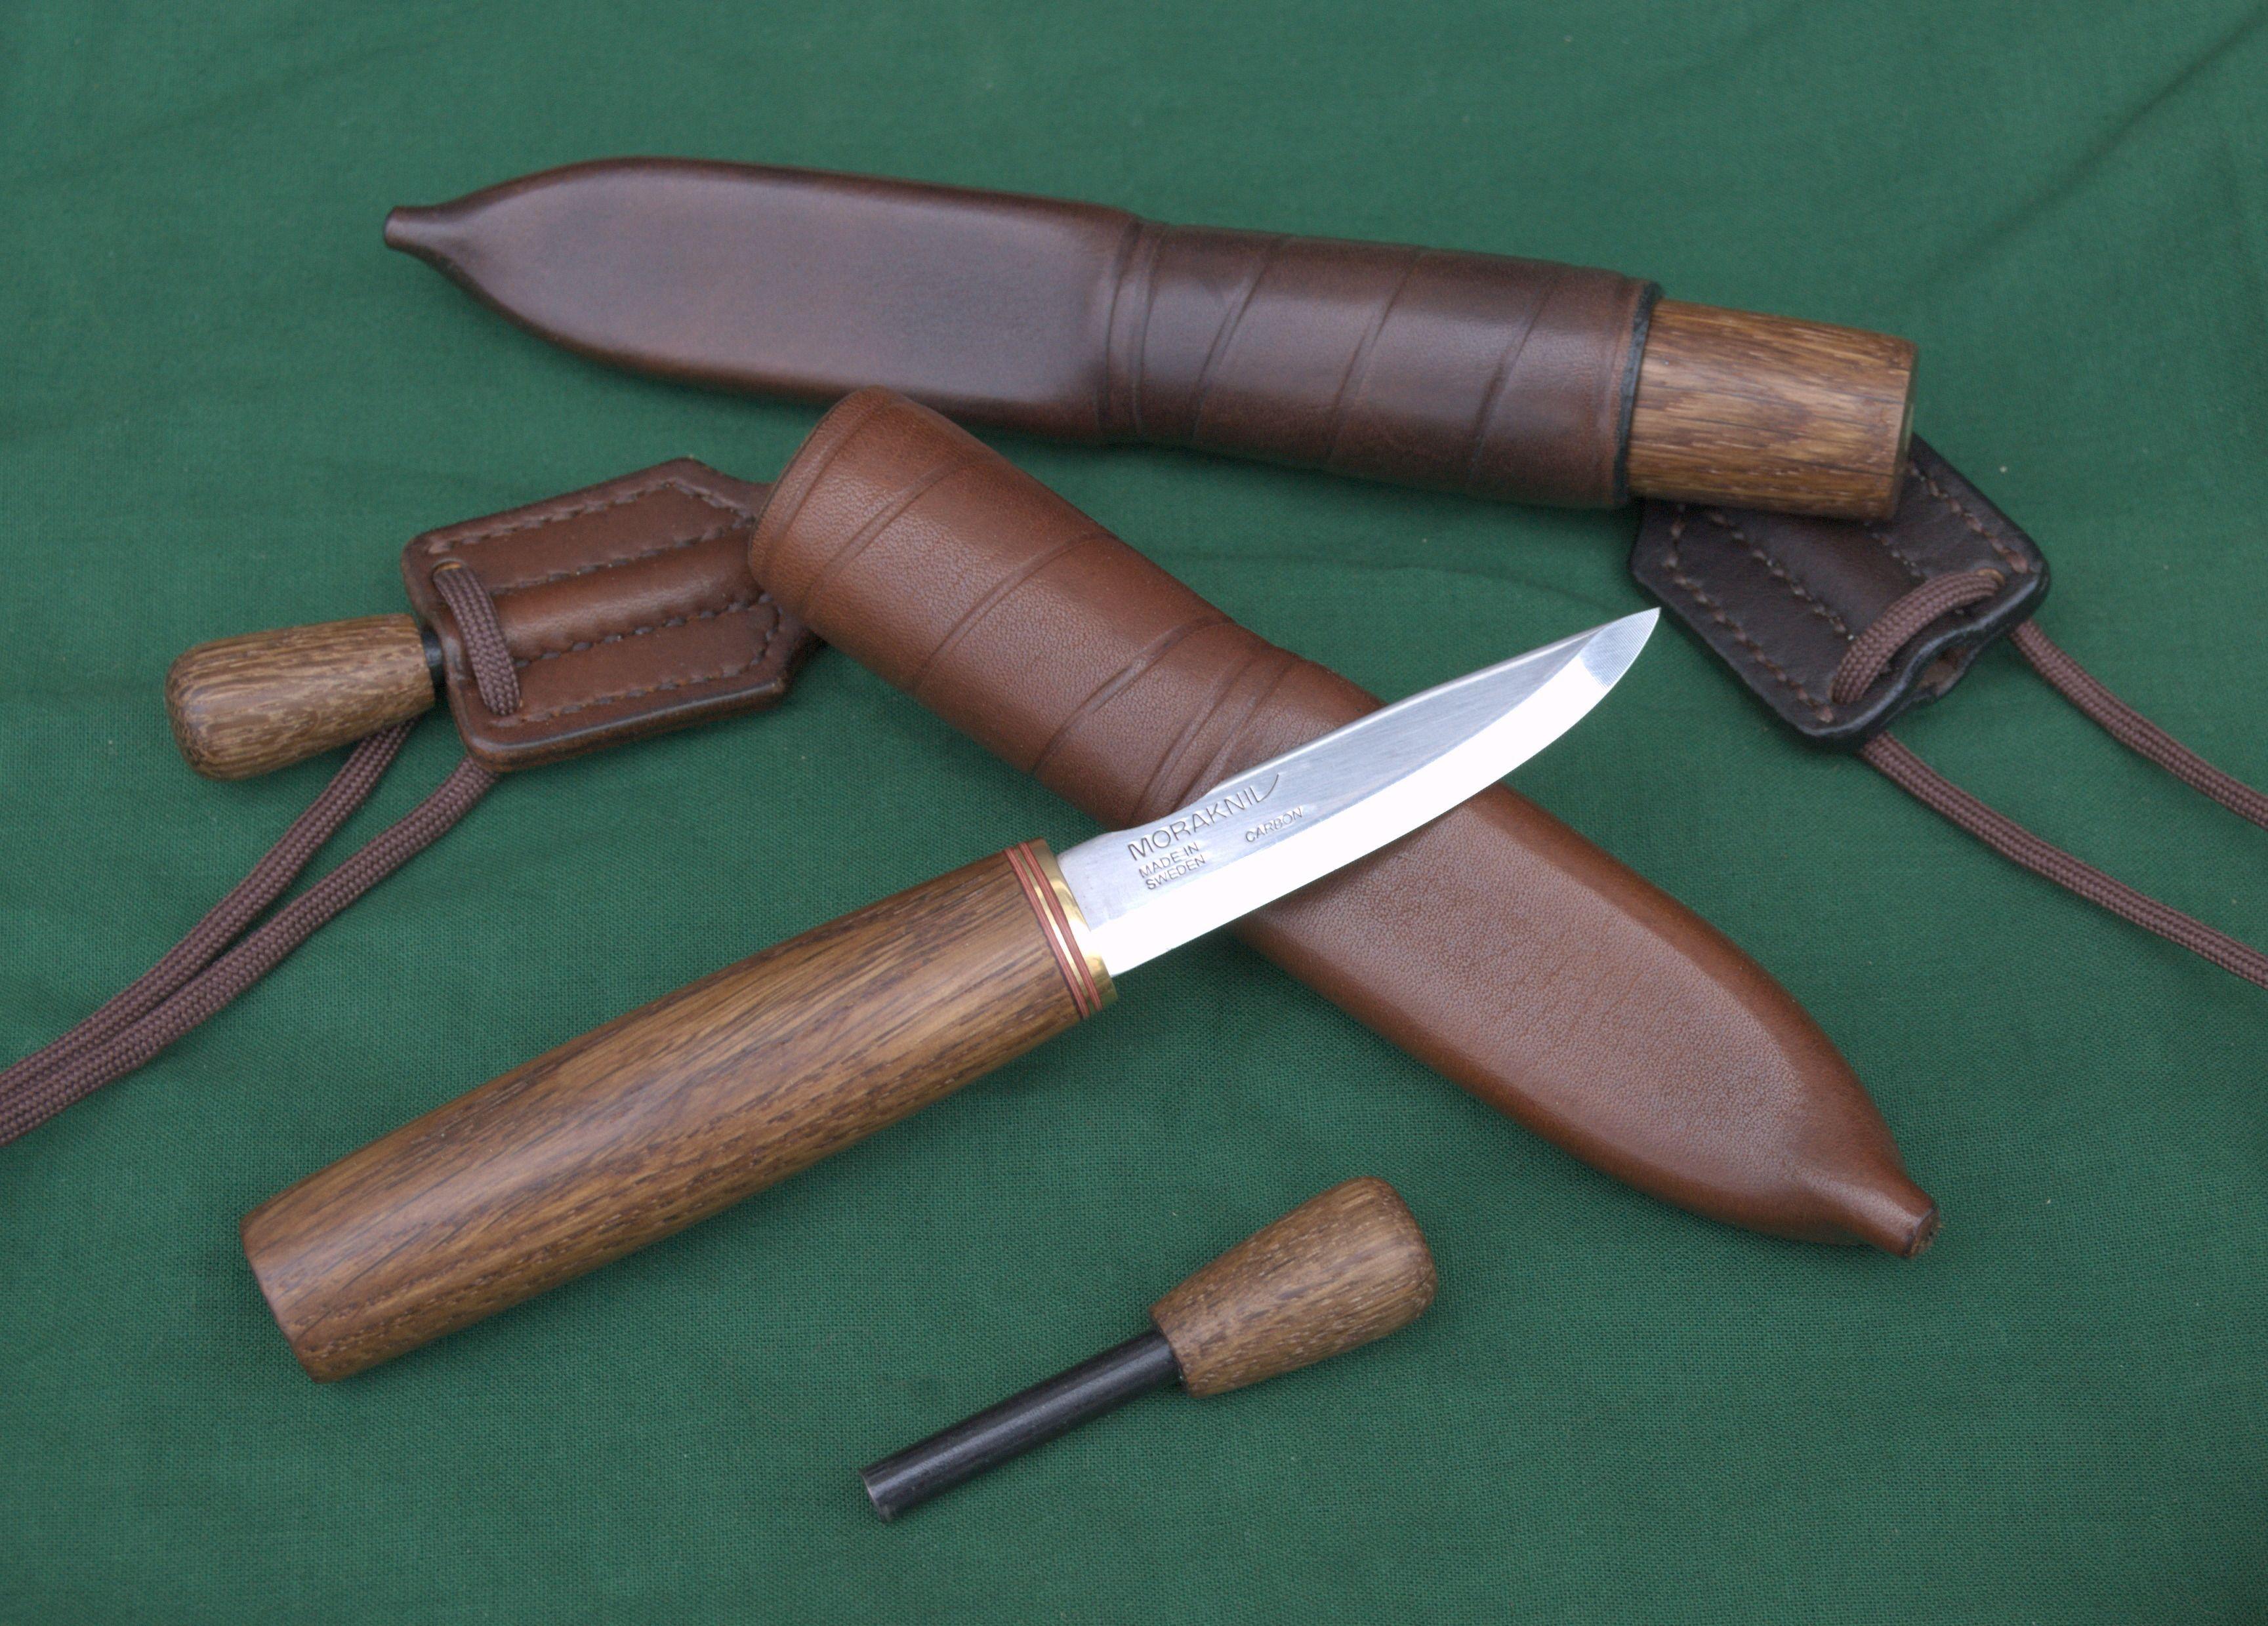 Morakniv 2 0 Blade With Fumed Oak Handle Firesteels And Nordic